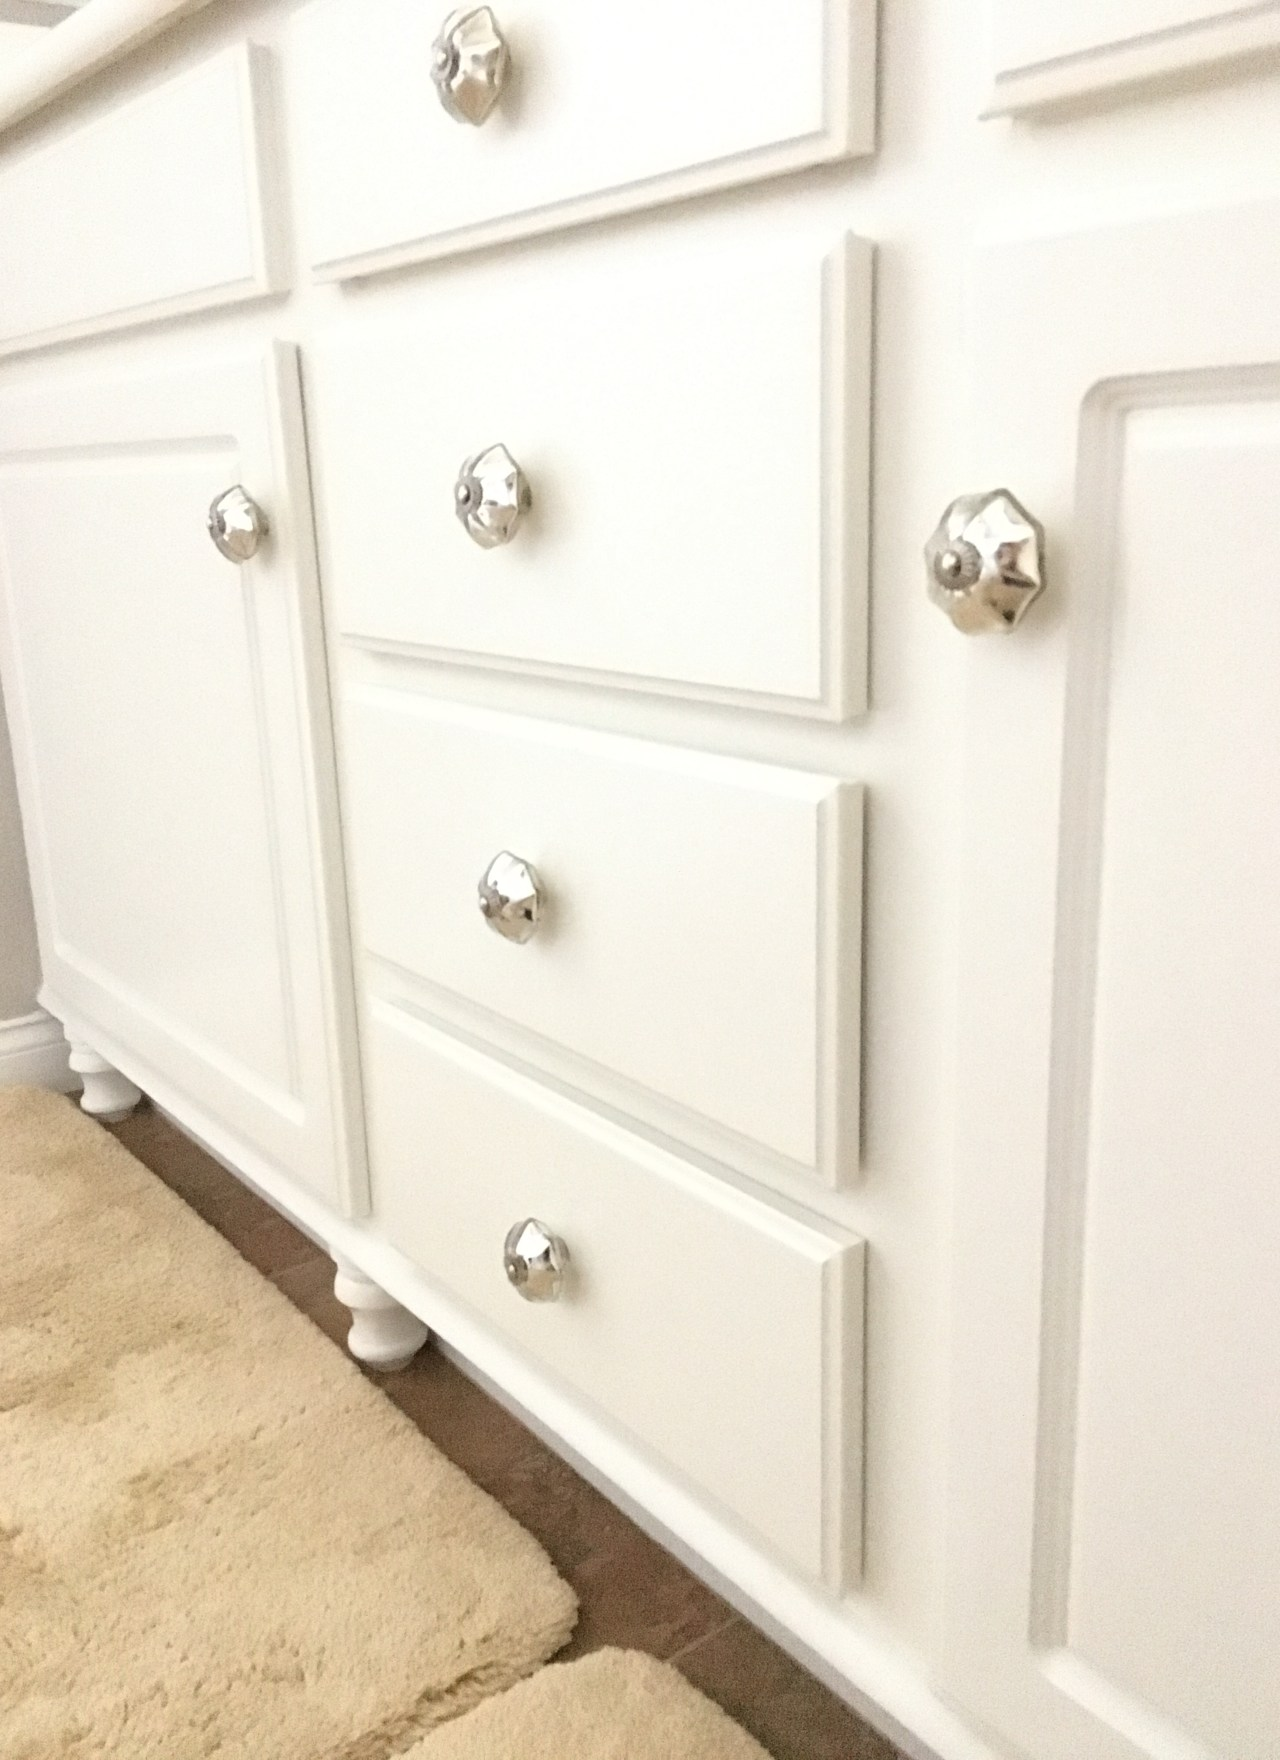 Repairing MDF Cabinets